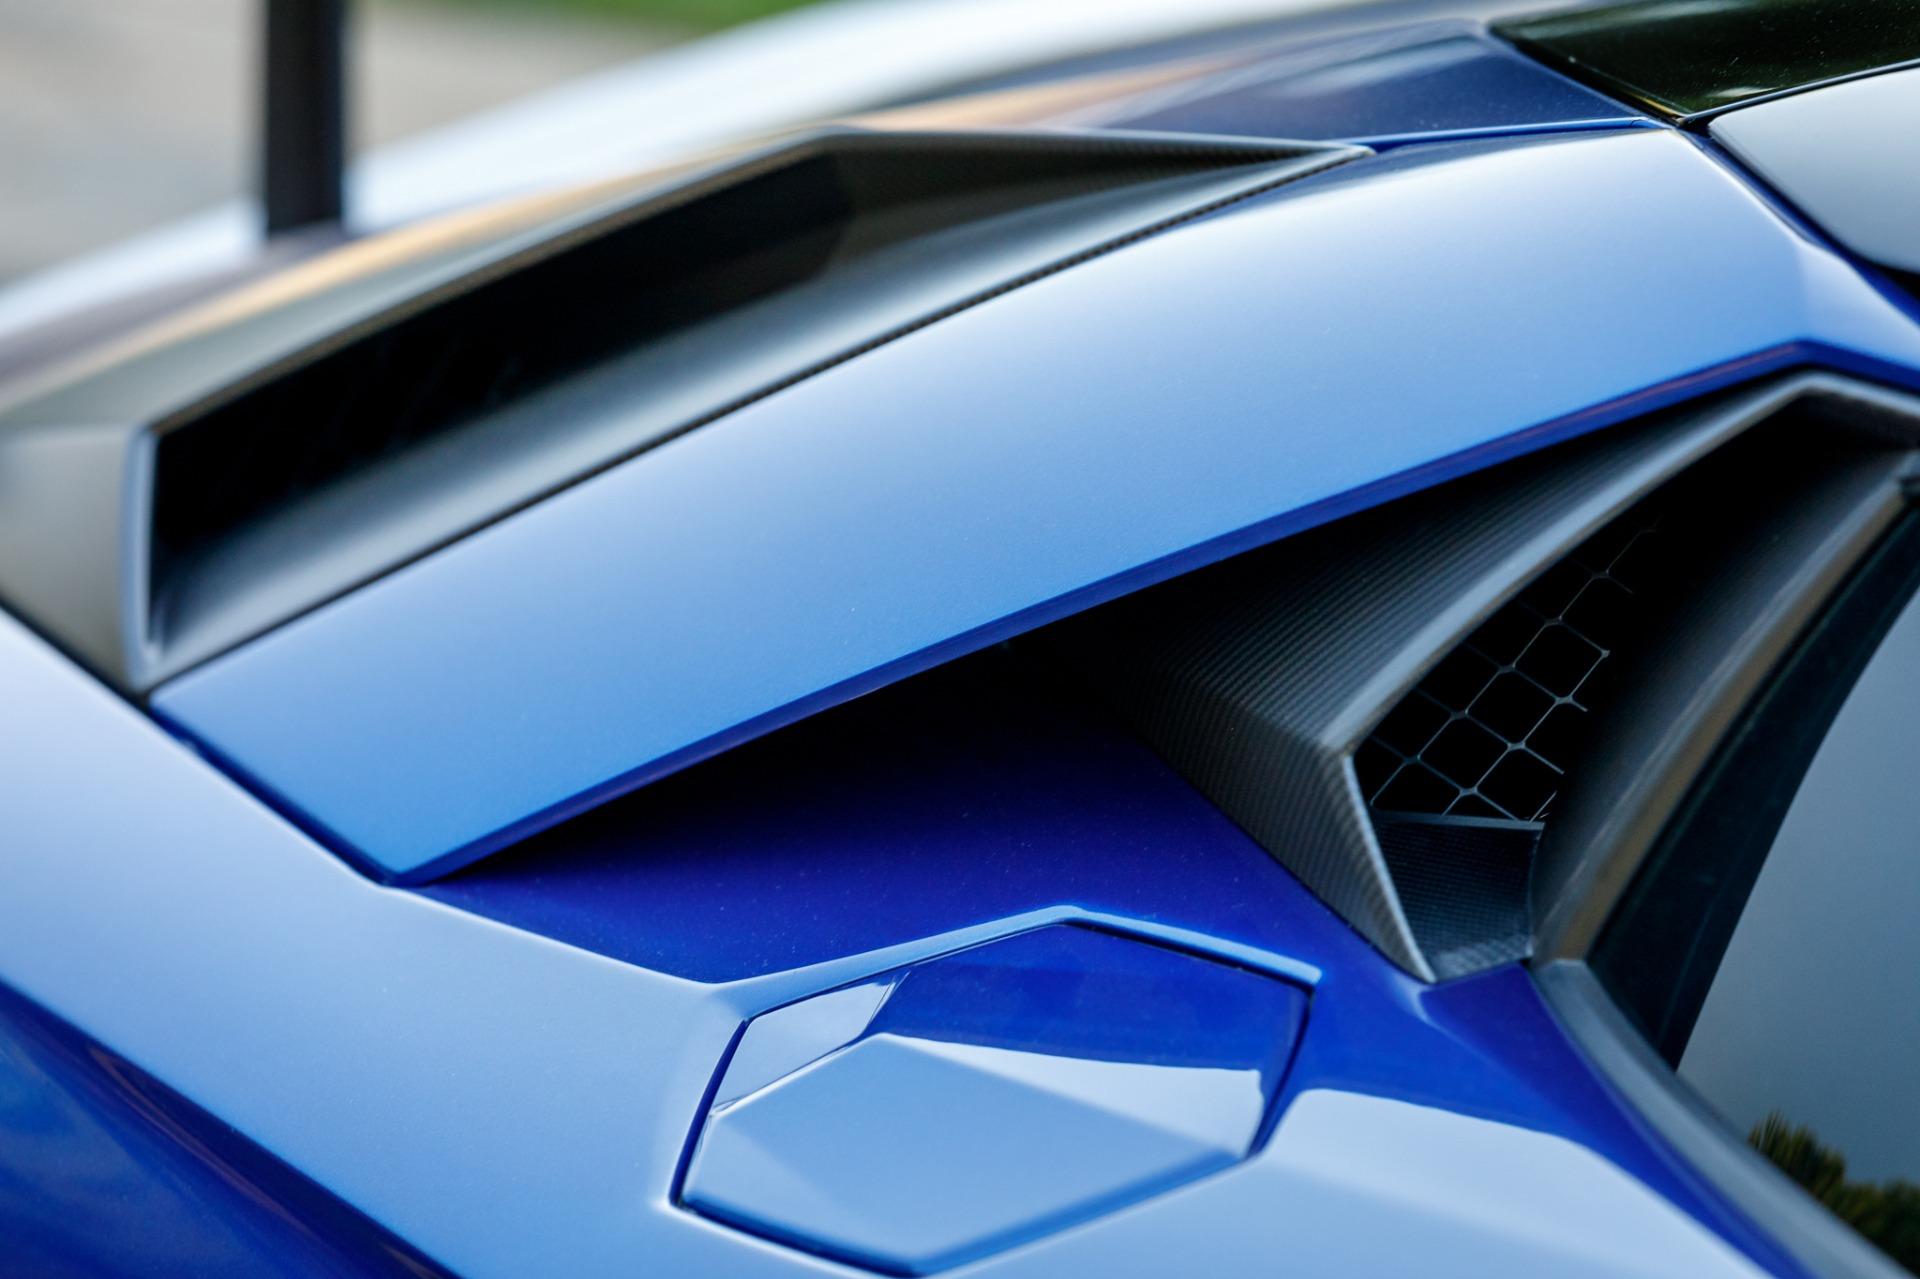 Used 2017 Lamborghini Aventador LP 750-4 SV / 740HP / AWD / 1930 MI / NAV / CAMERA for sale Sold at Formula Imports in Charlotte NC 28227 23